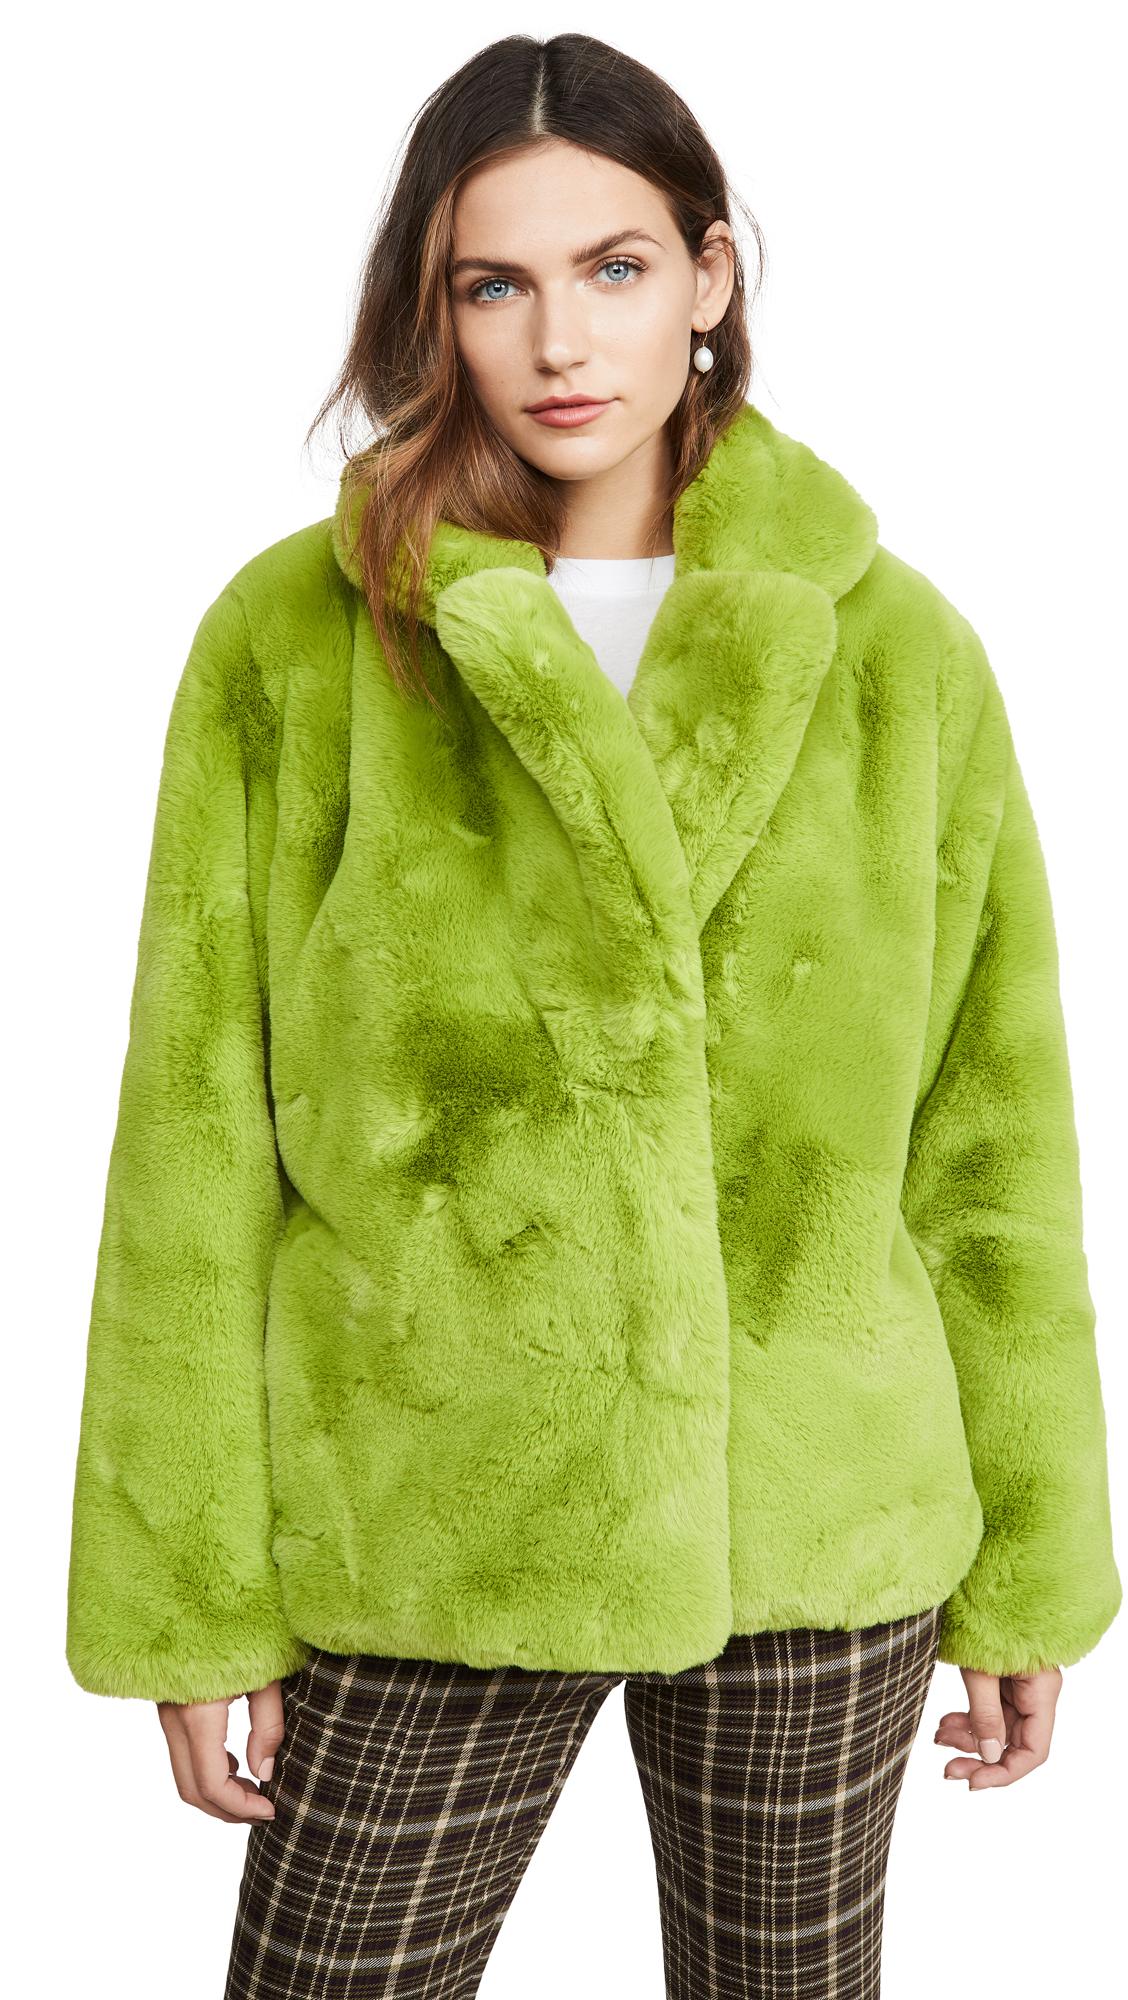 Apparis Manon Faux Fur Jacket - Neon Green